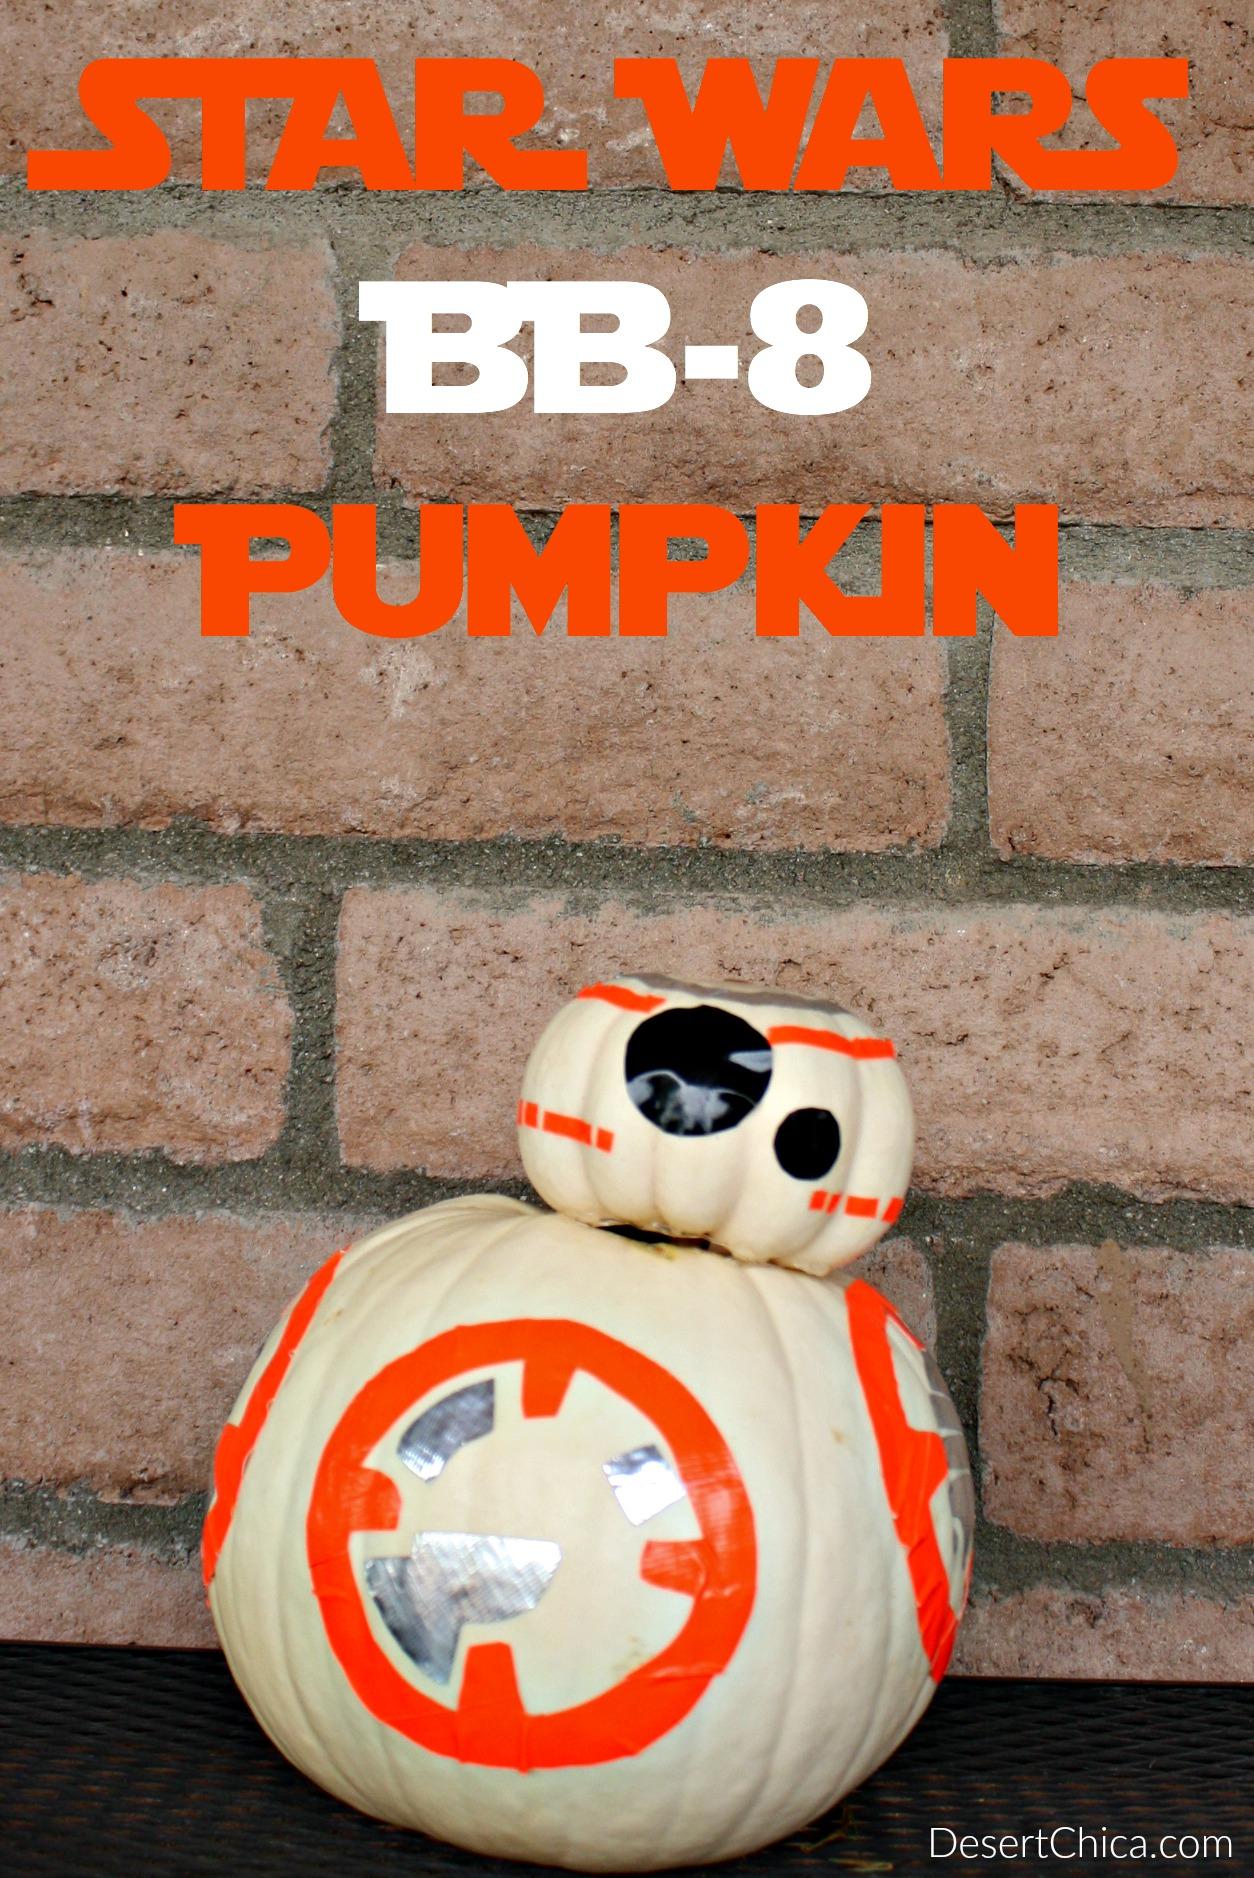 Easy Star Wars BB-8 Pumpkin